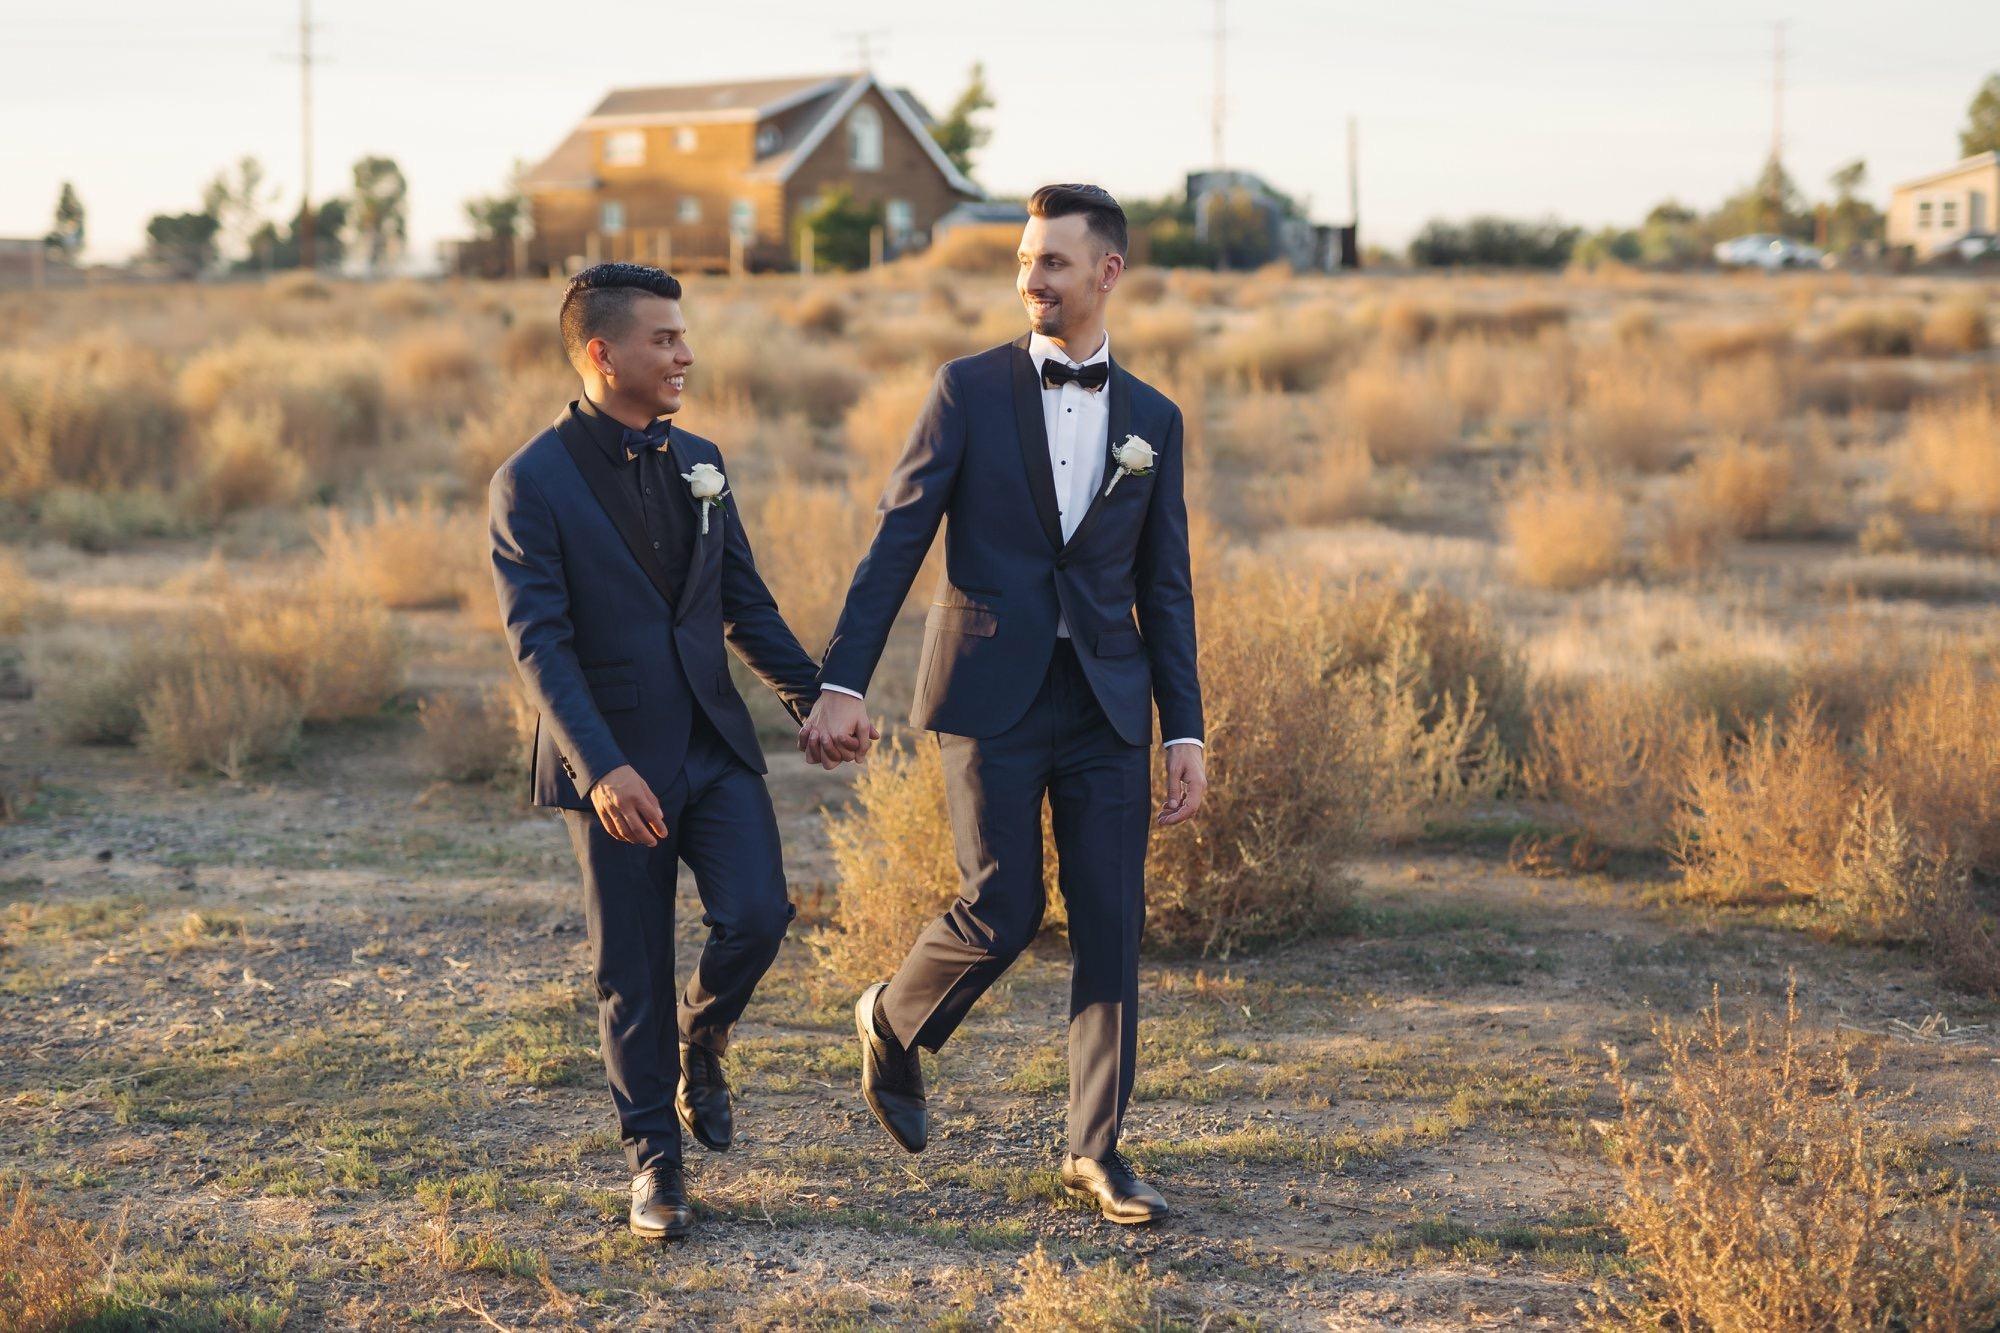 Postponing a Wedding or Honeymoon? Enter the Honeymoon Your Way Giveaway